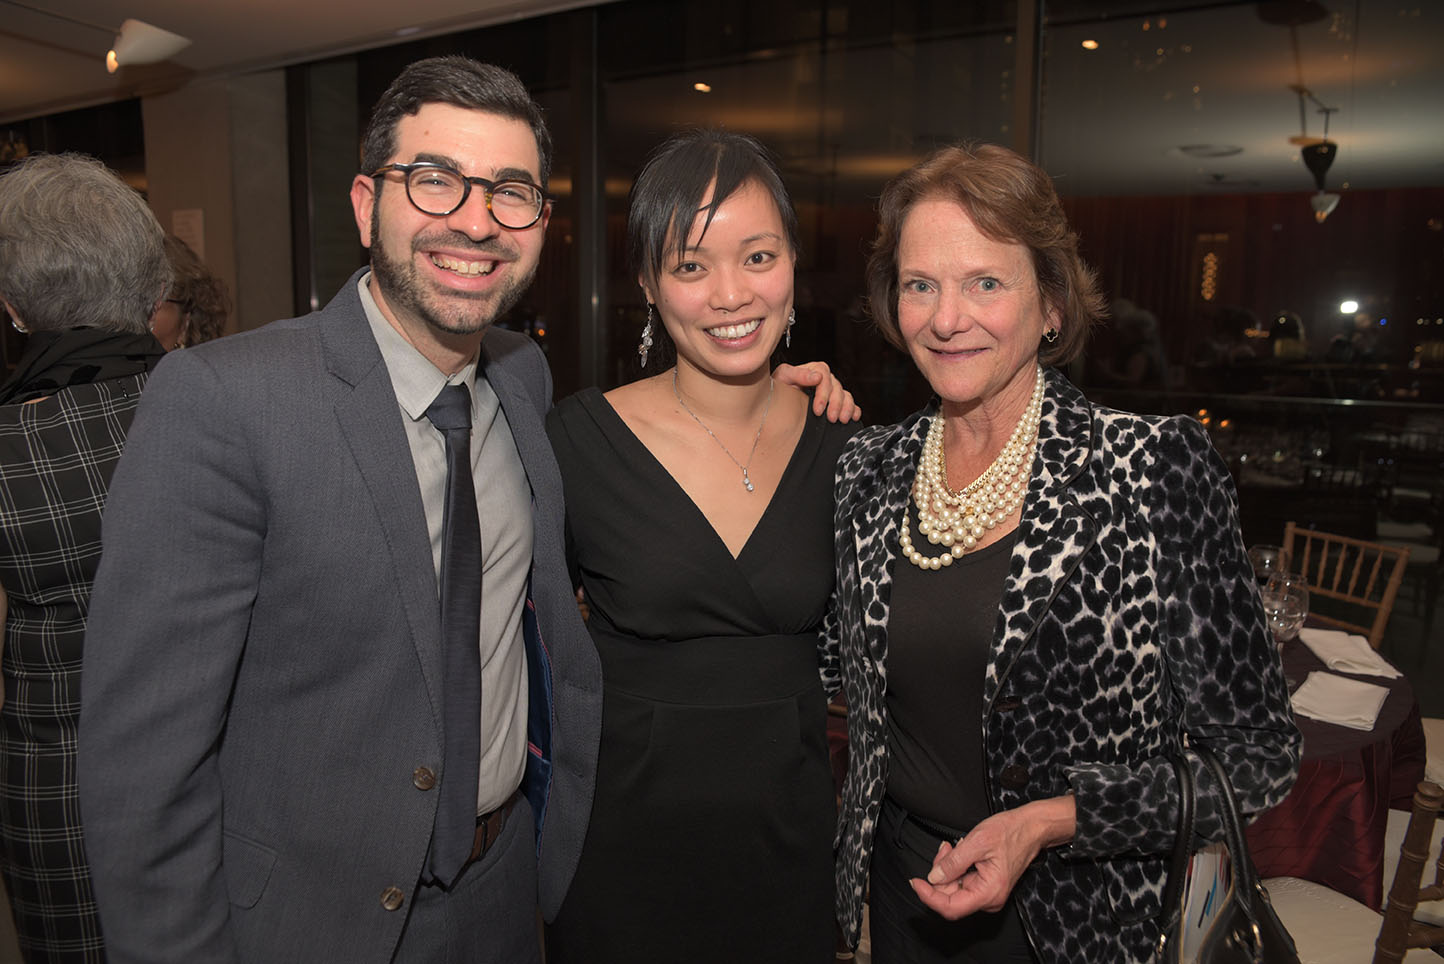 Michael Brown, Jessica Tong, CMS Board member Kathe Williamson